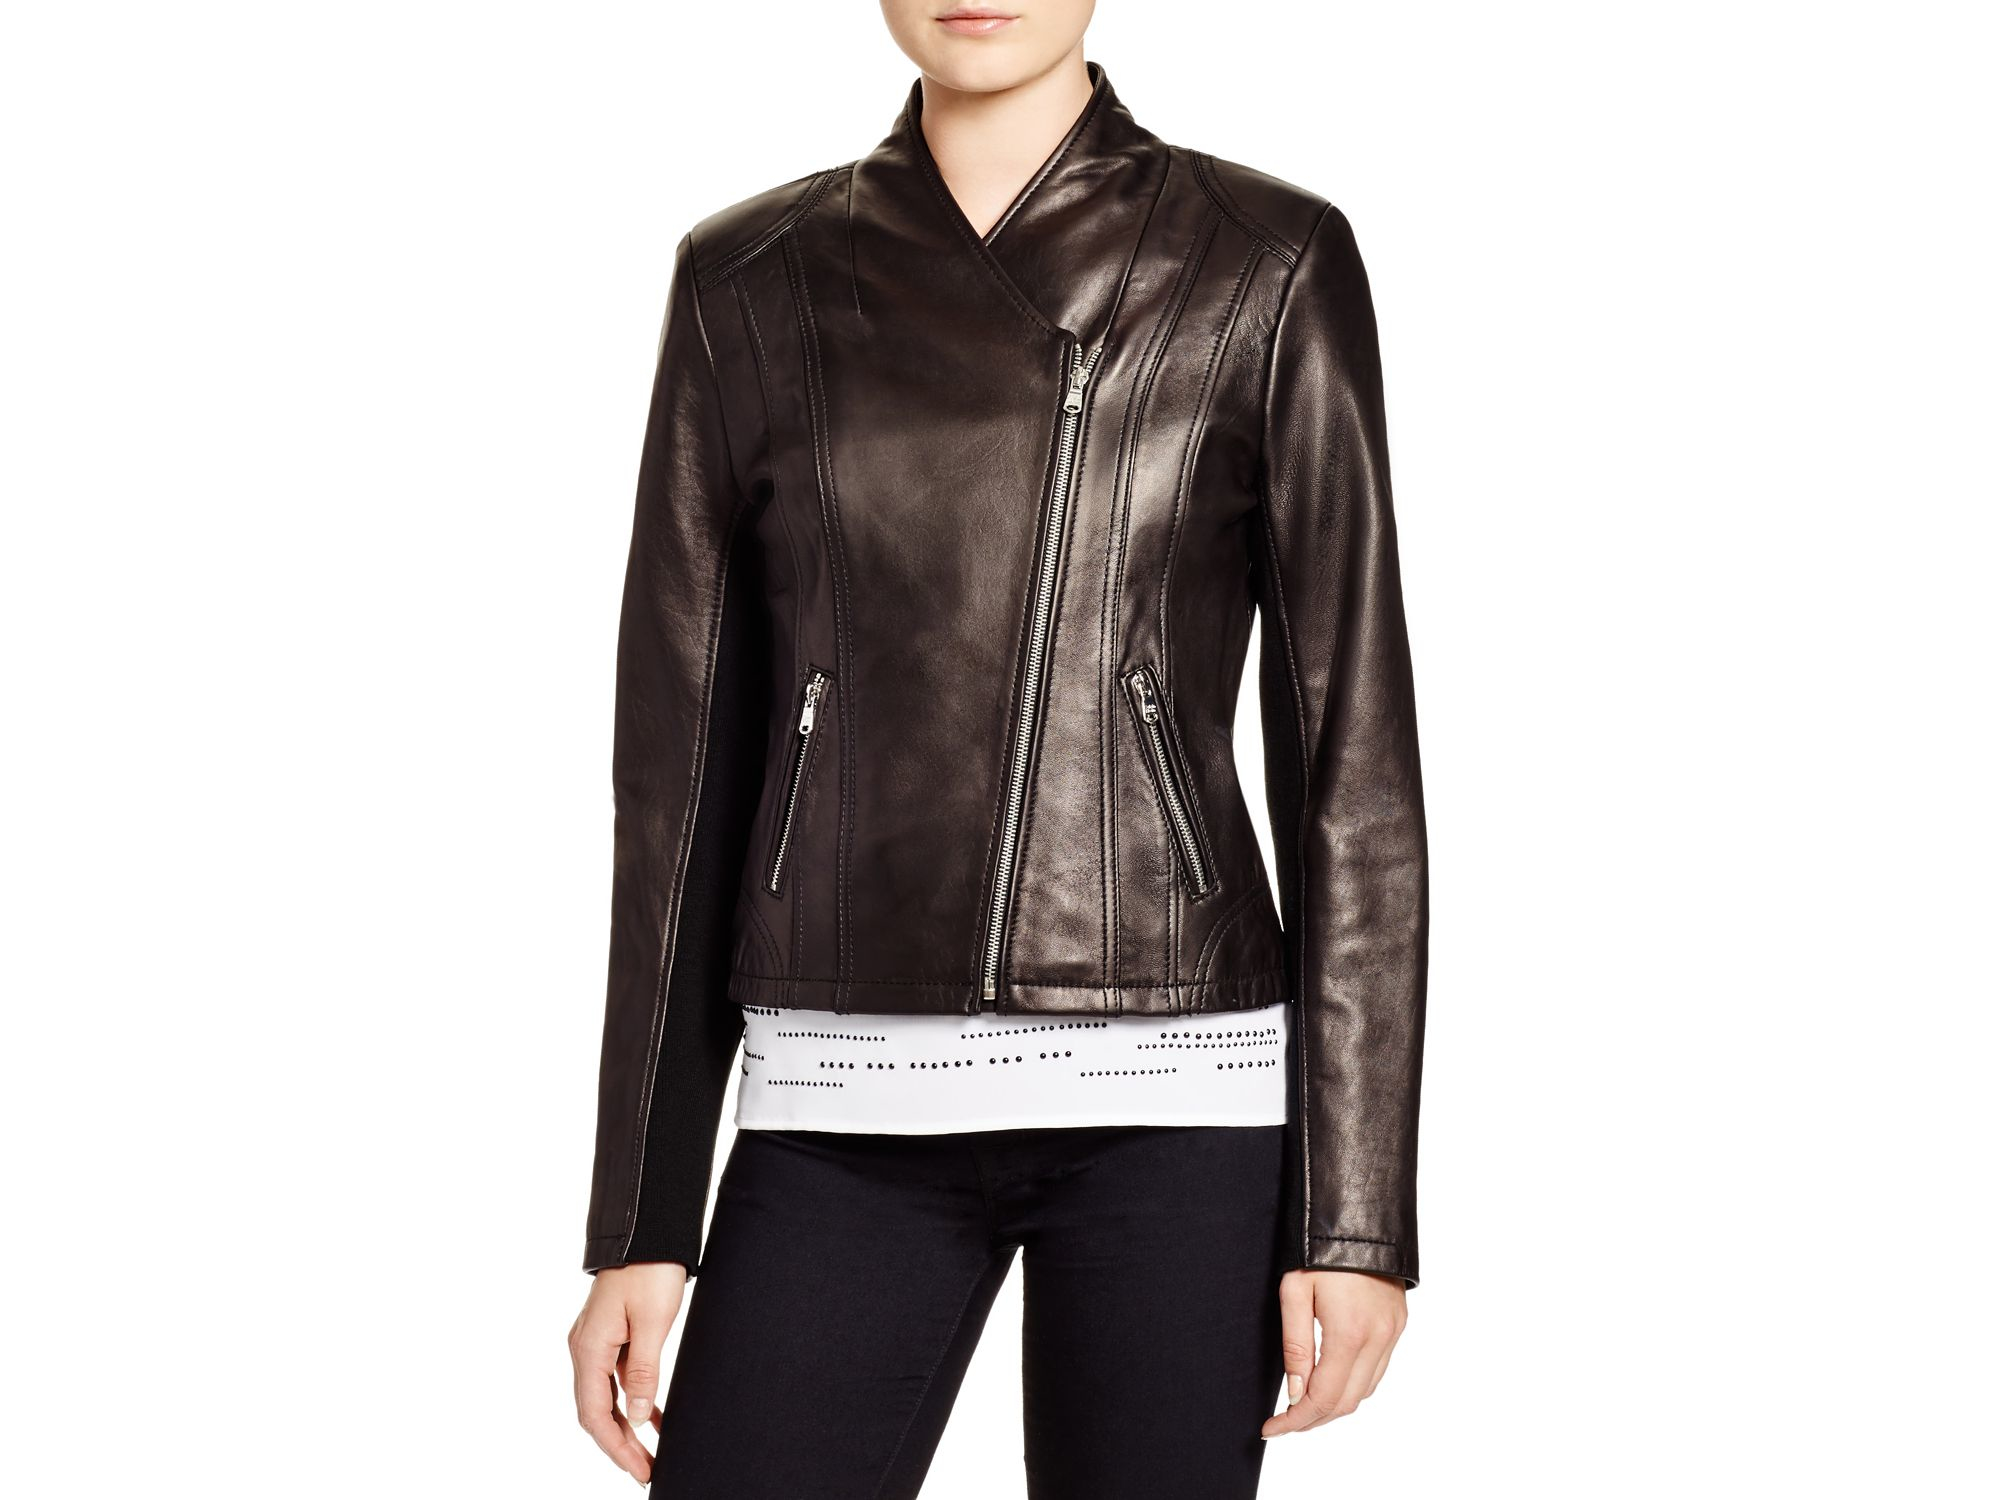 1fed0f3b Calvin Klein Black Leather Moto Jacket - Bloomingdale's Exclusive